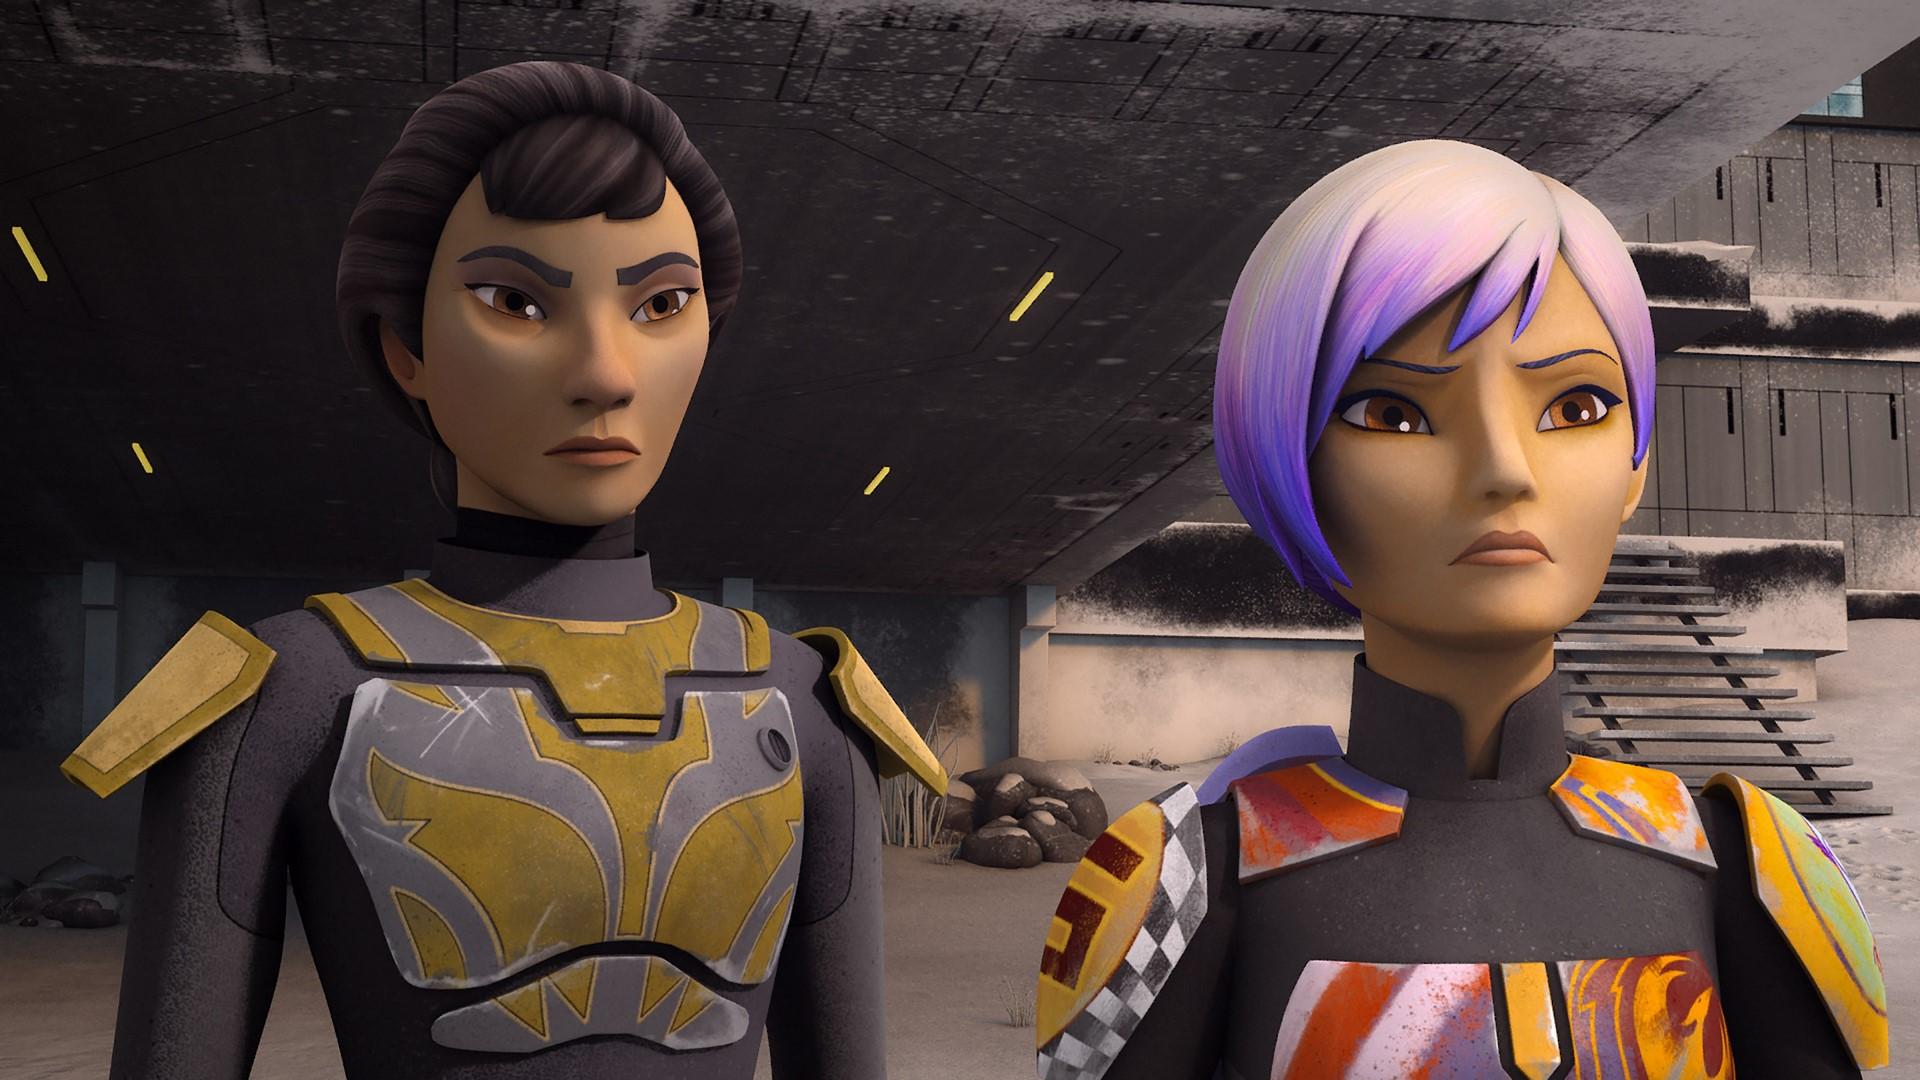 Sabine hot star wars rebels Sabine's Sick